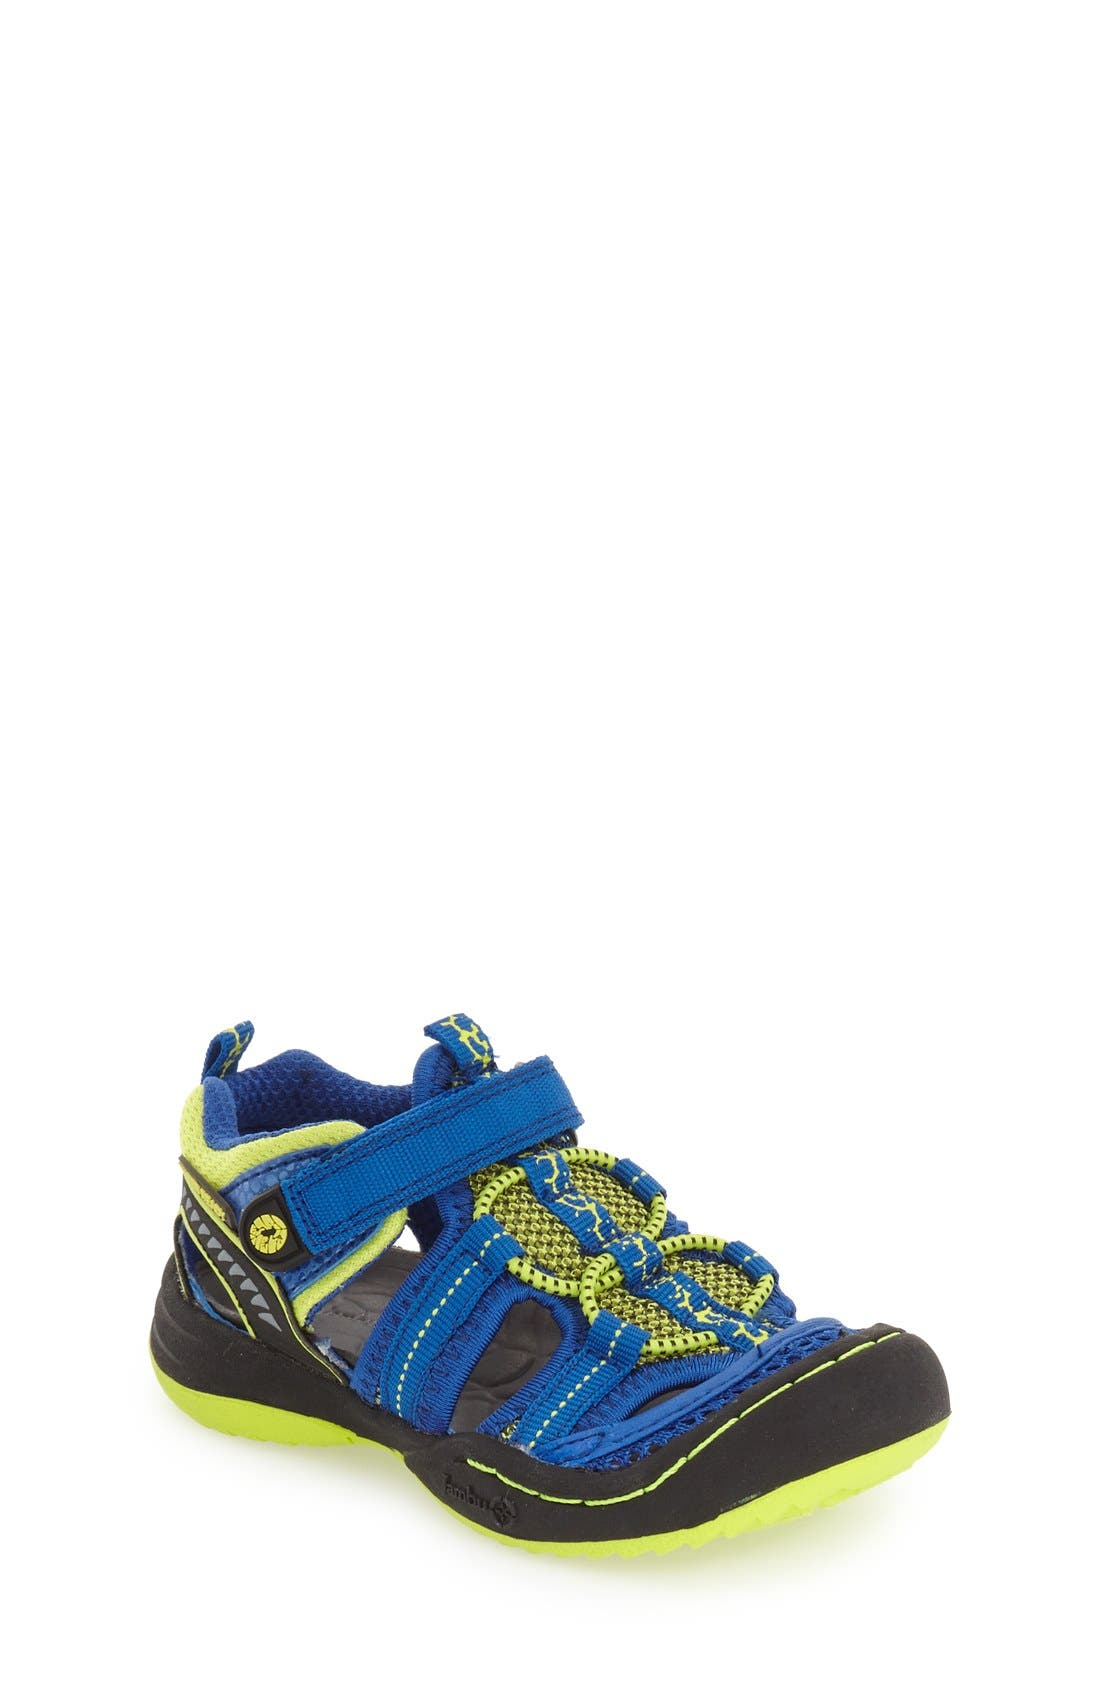 JAMBU 'Piranha' Water Sport Sandal